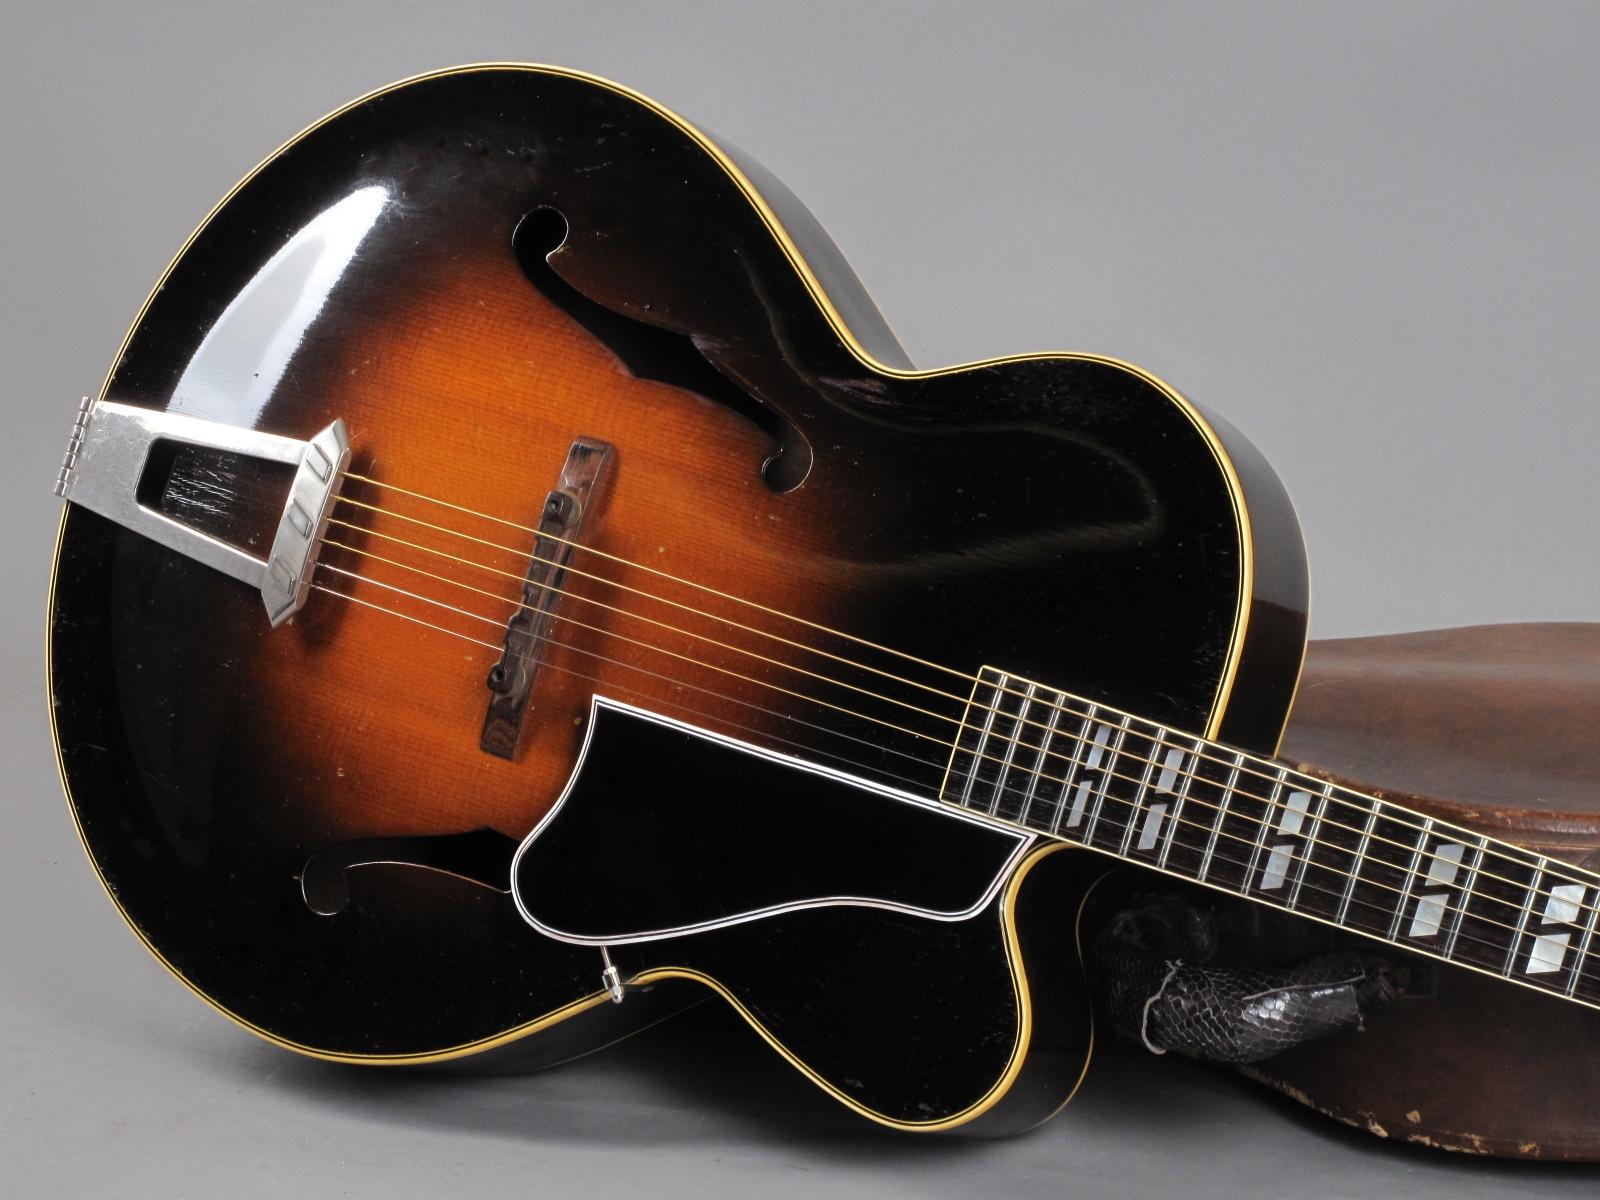 https://guitarpoint.de/app/uploads/products/1948-gibson-l-7c-sunburst-2/1948-Gibson-L-7-C-Sunburst-A2294_19.jpg